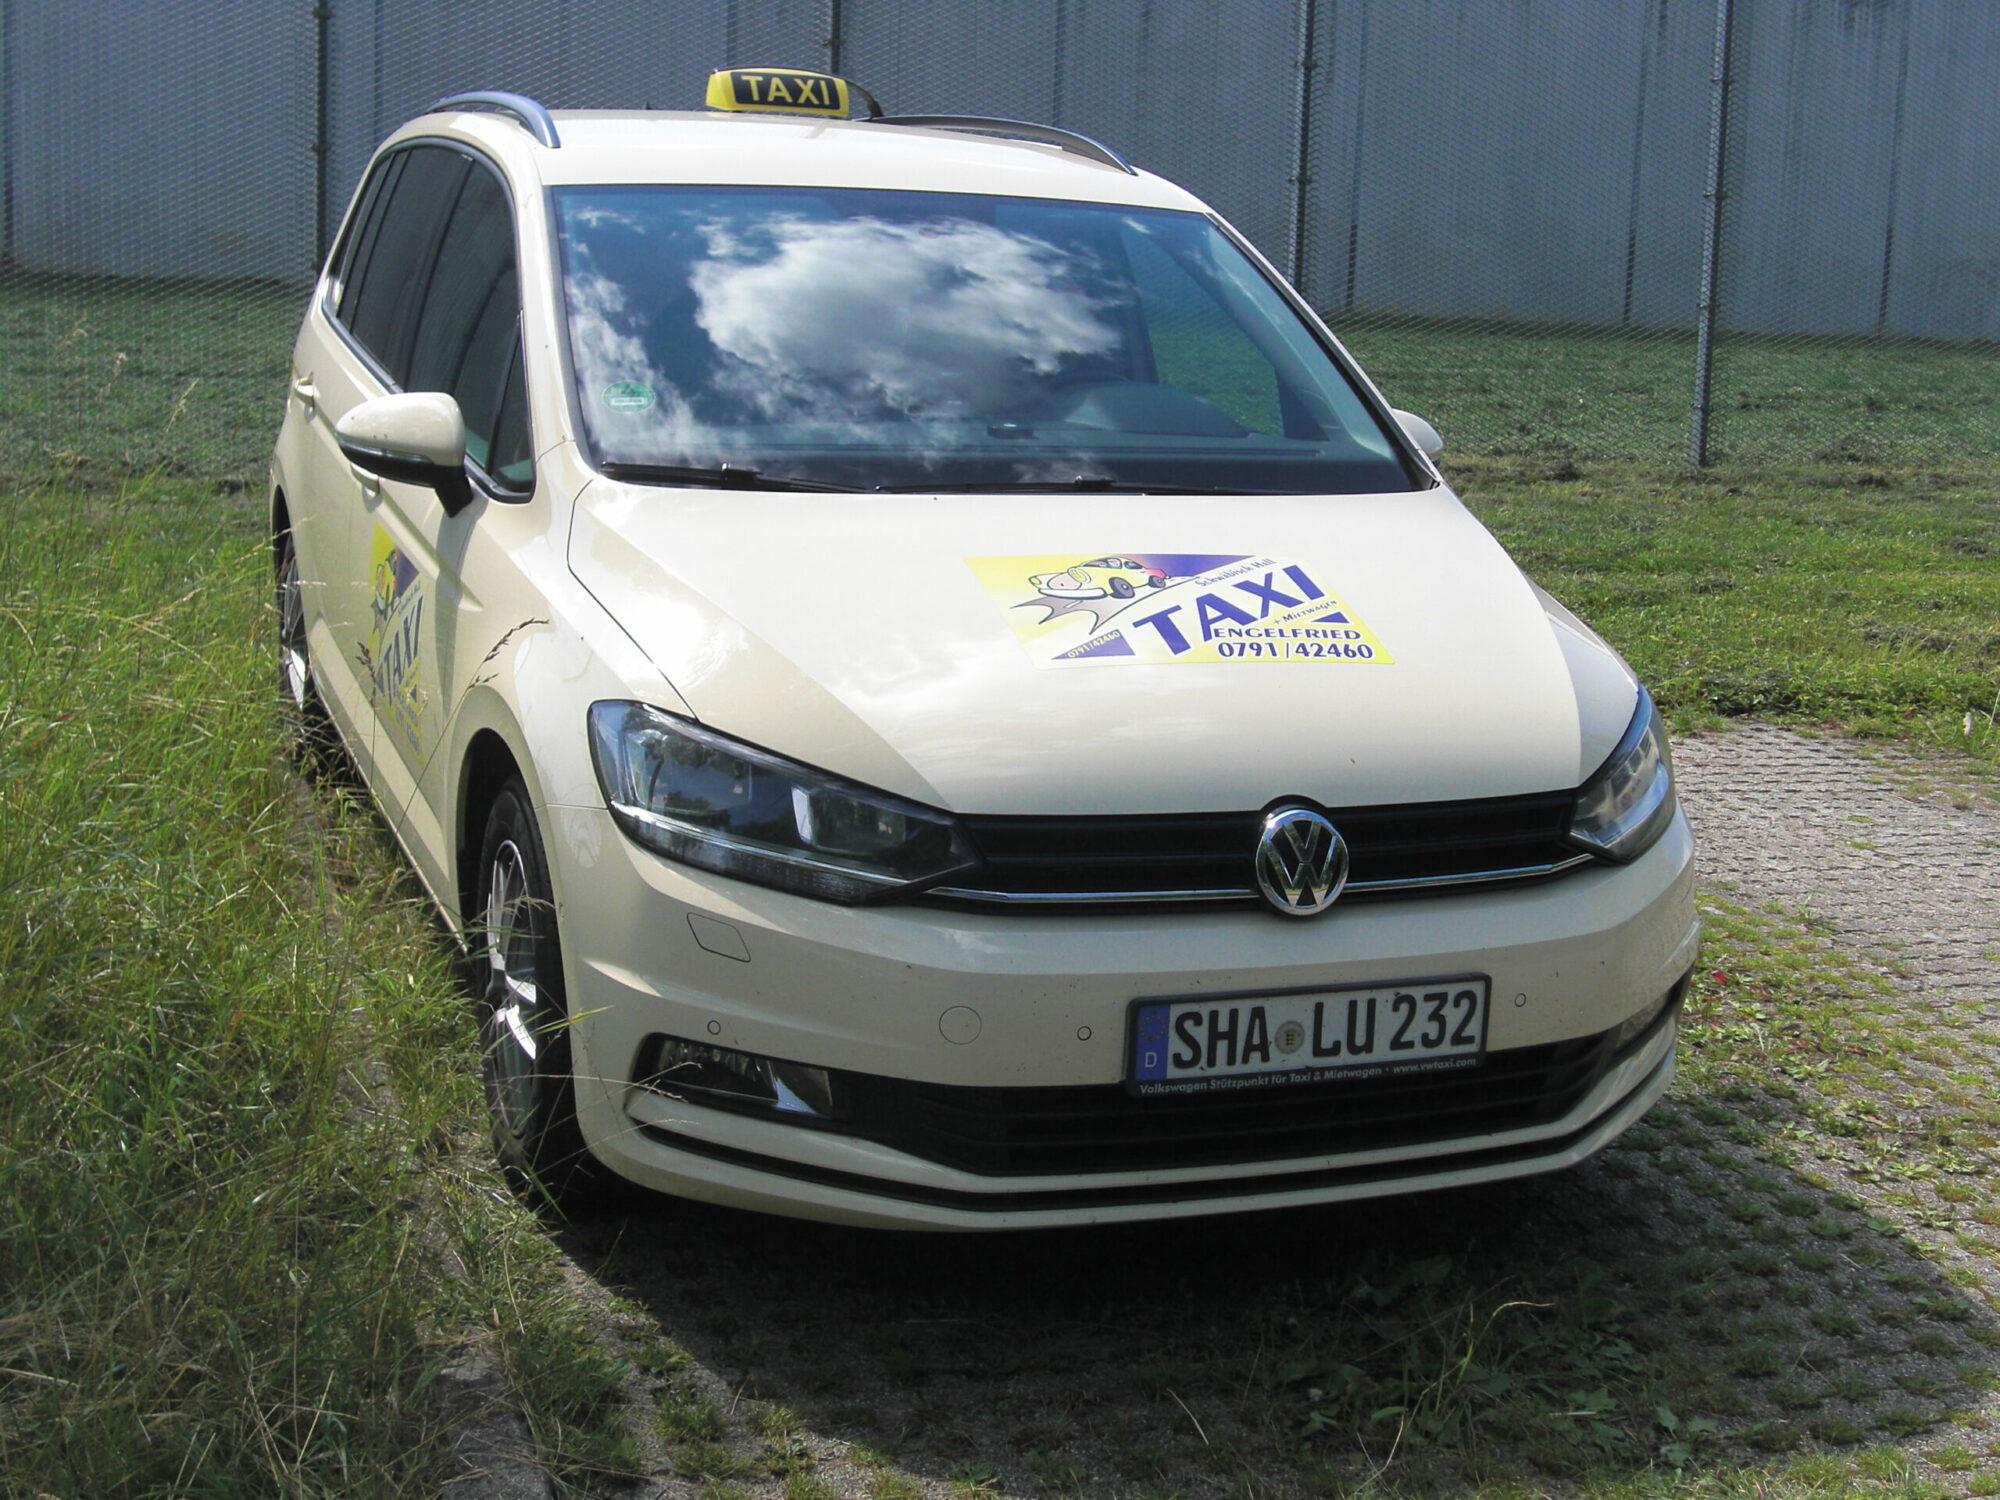 Taxi-Engelfried